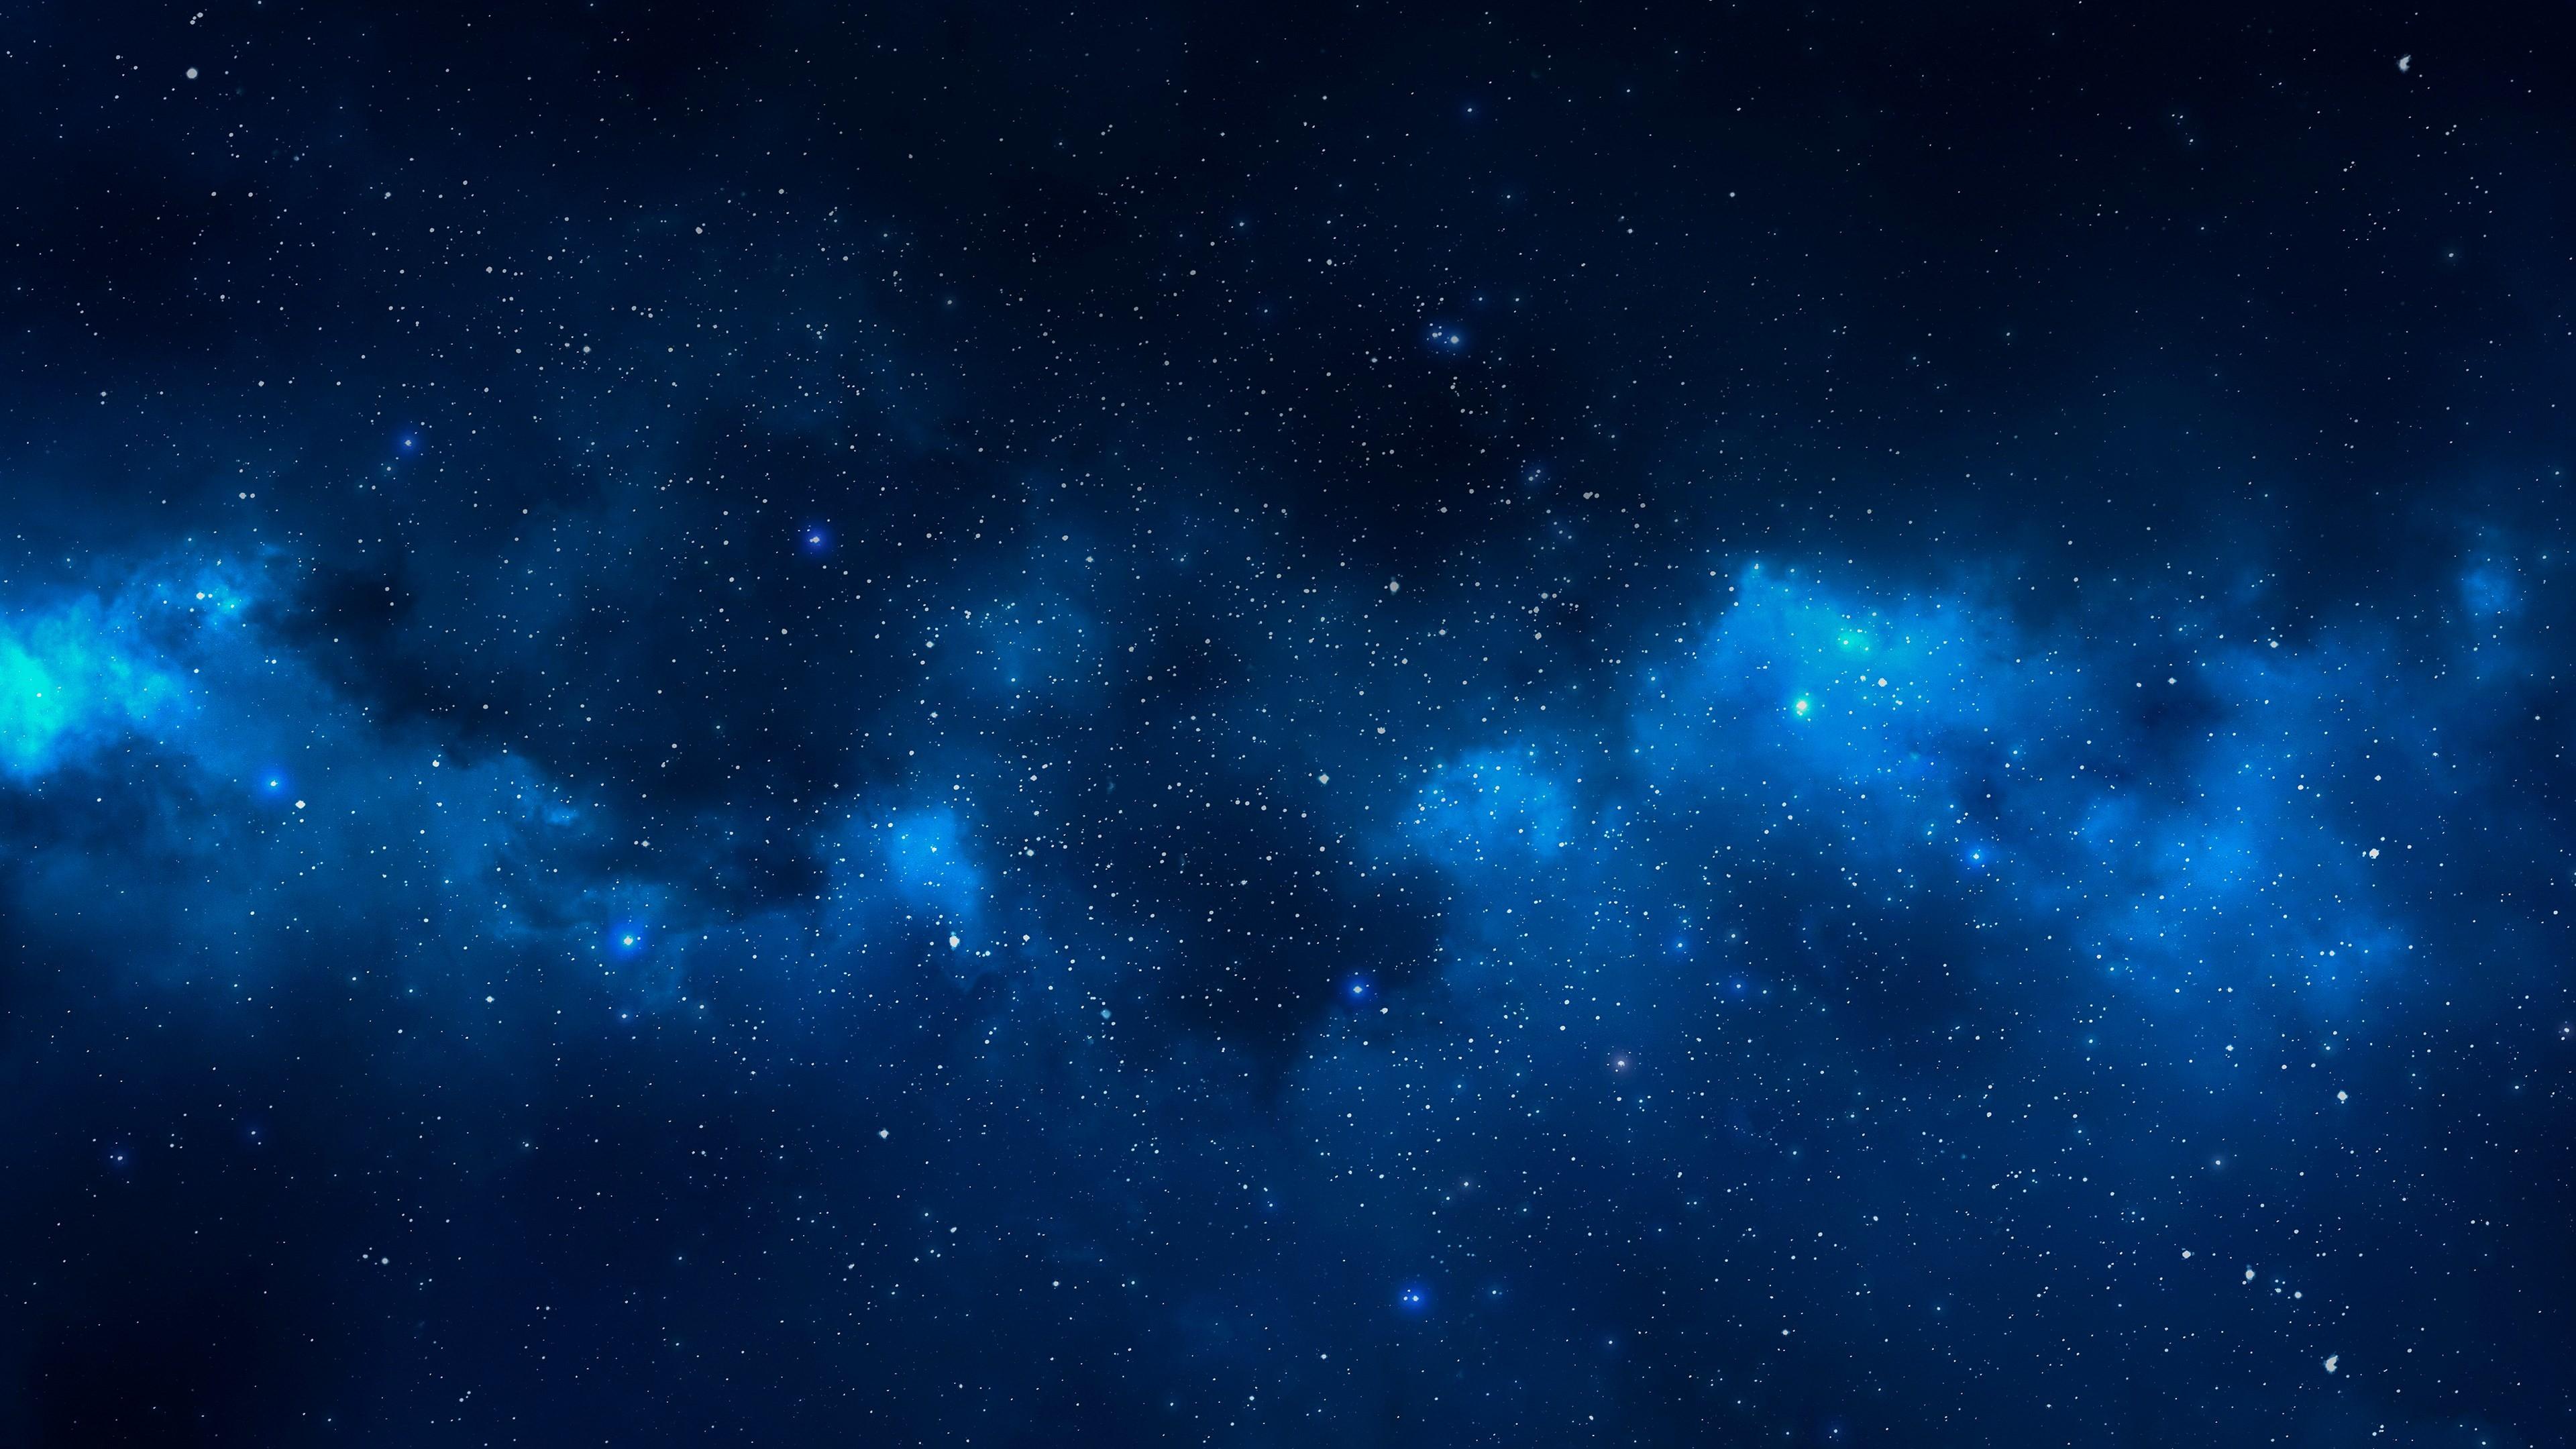 desktop wallpaper for space